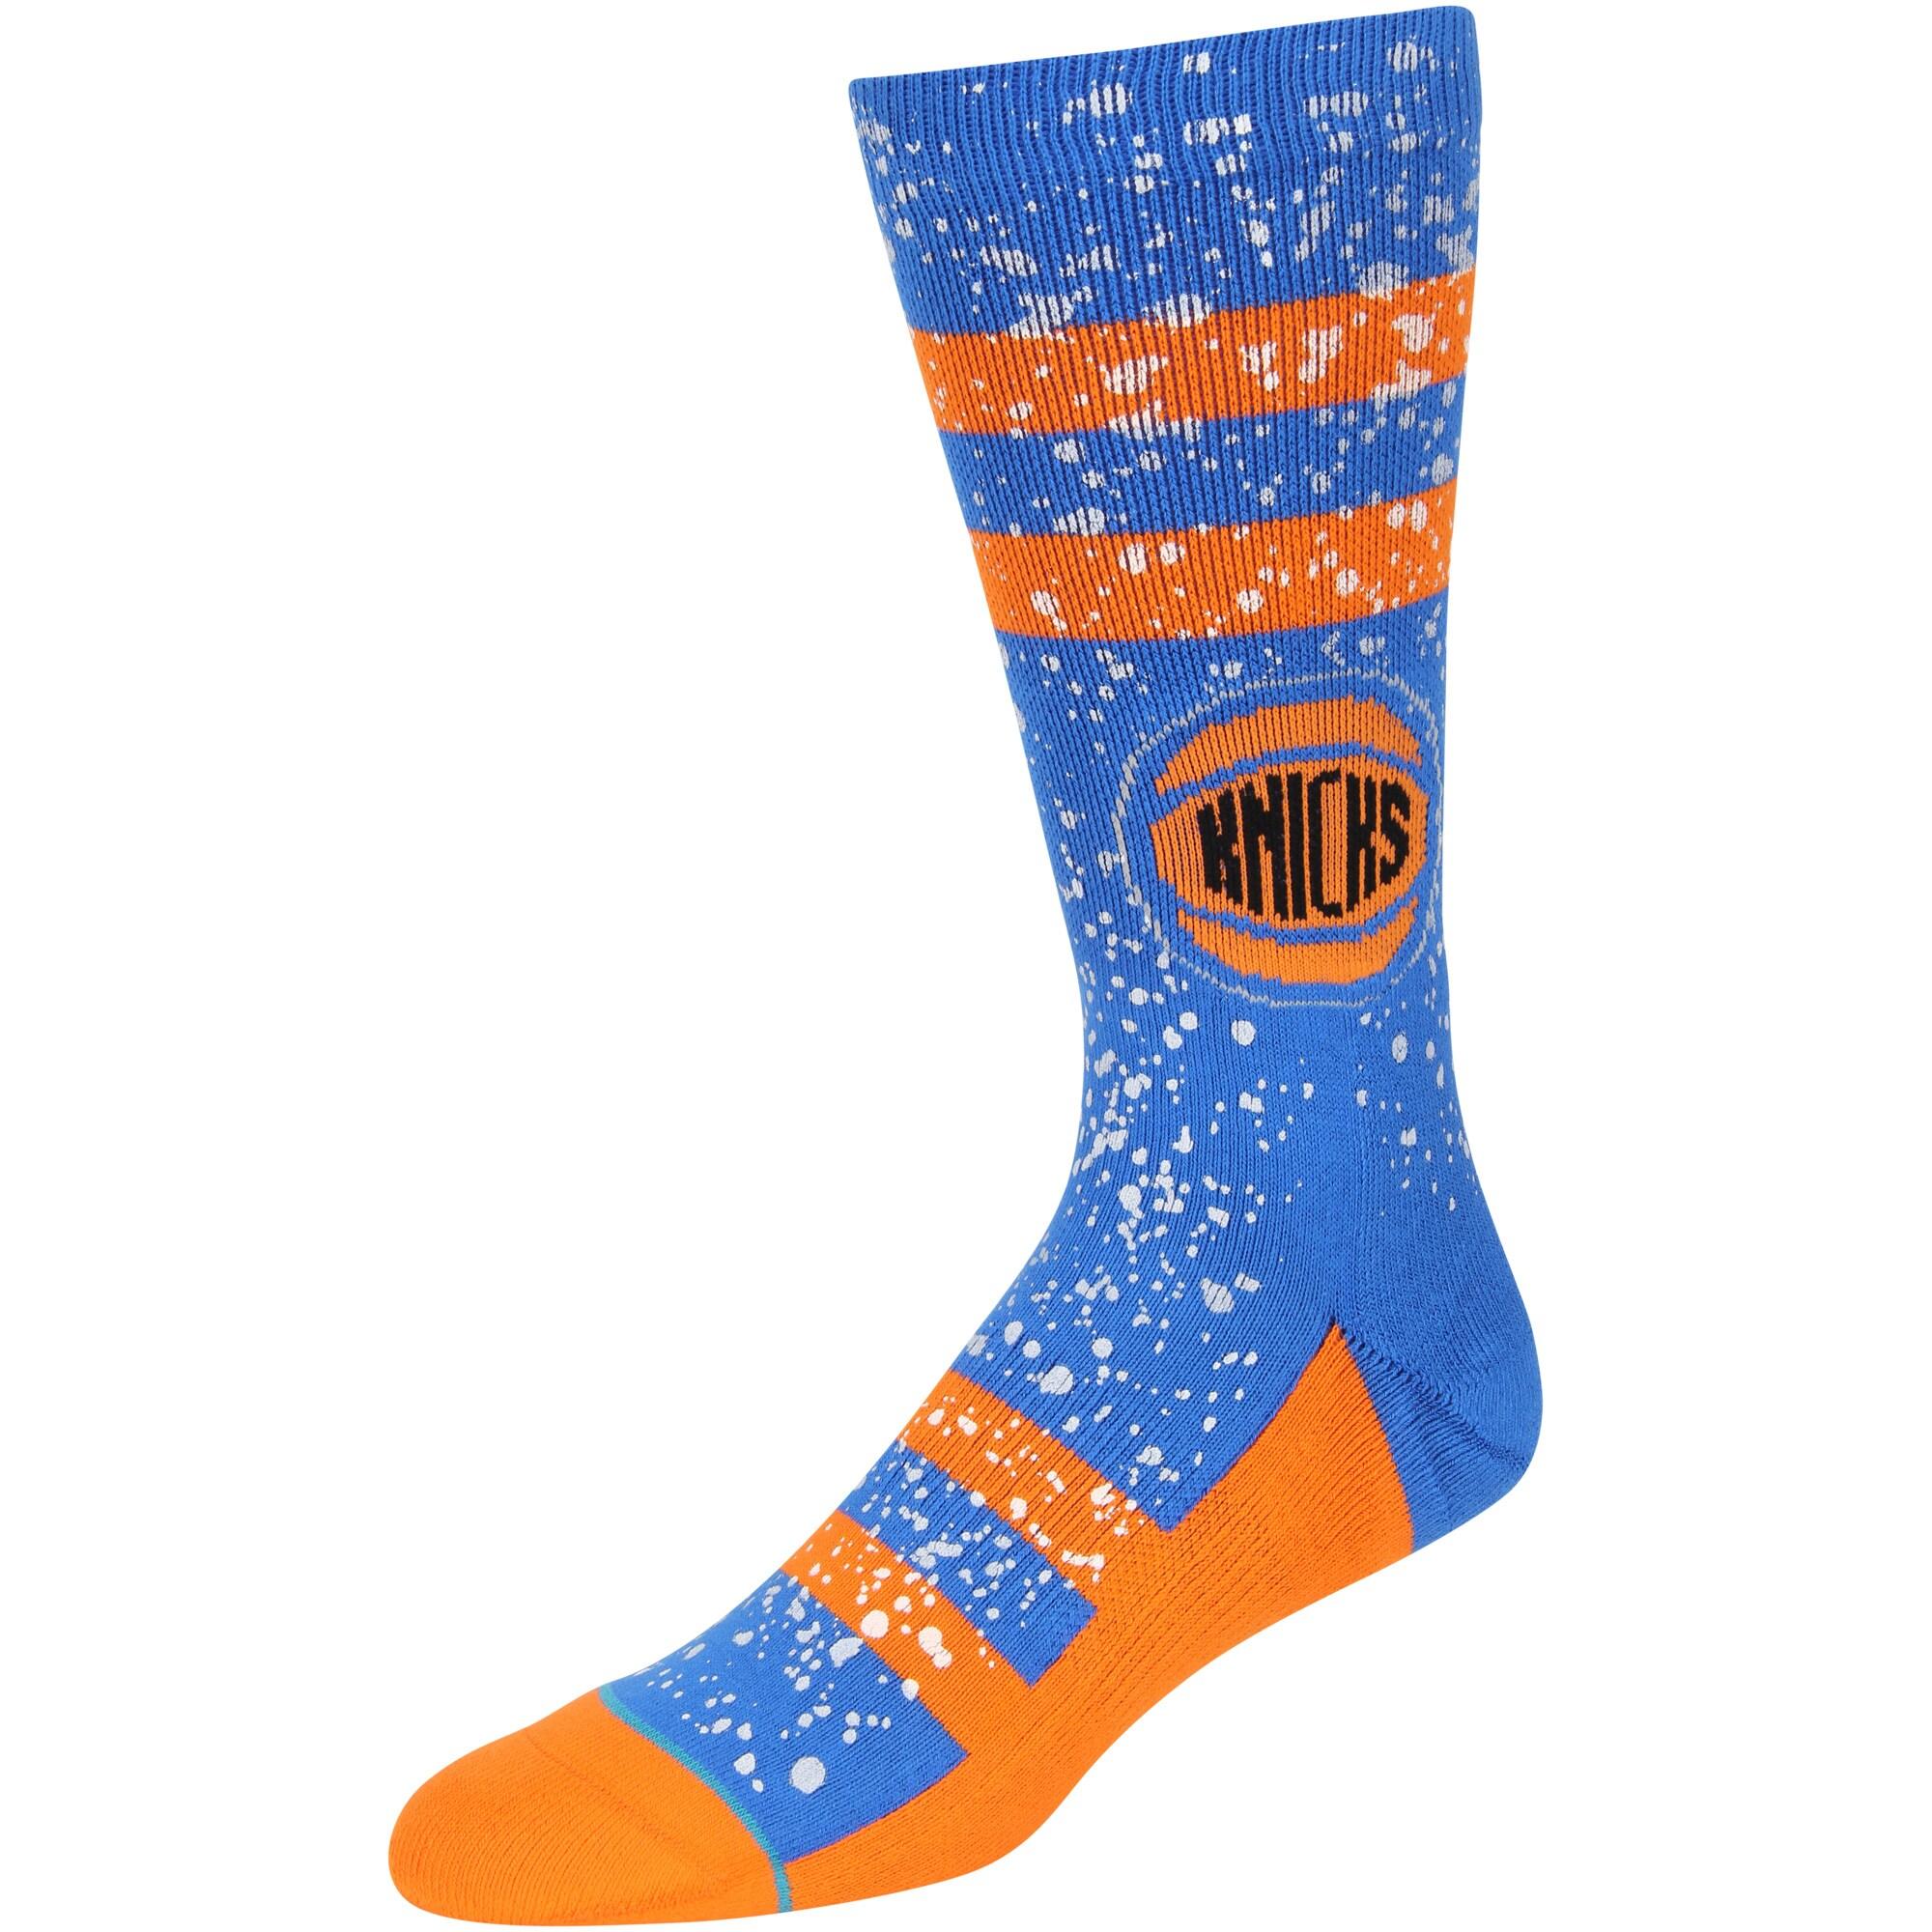 New York Knicks Stance Overspray Crew Socks - Royal